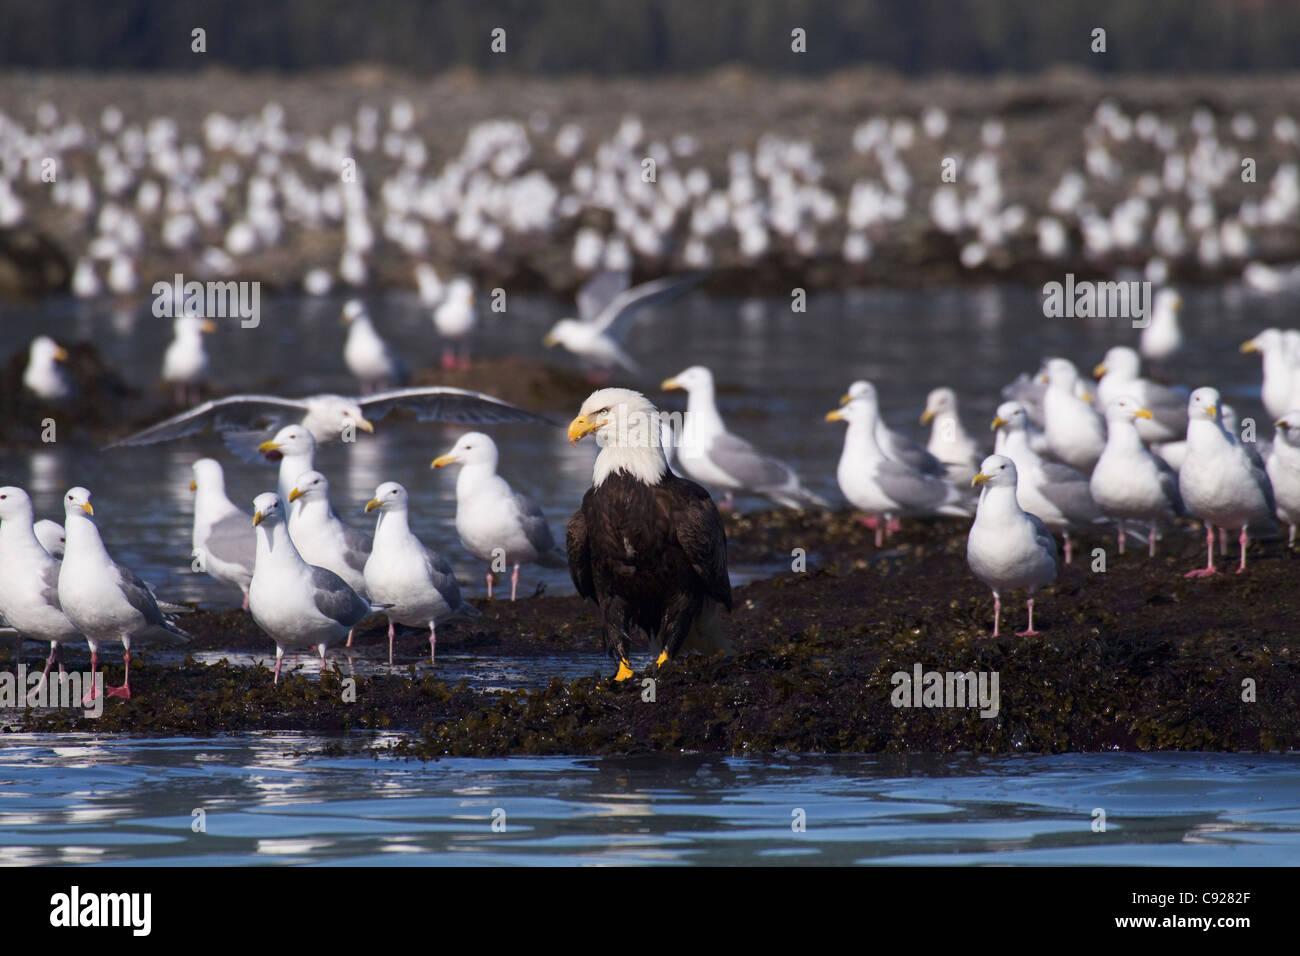 Bald Eagle sits amongst hundreds of Glaucous-winged gulls on the tidal flats waiting to catch herring, Alaska - Stock Image